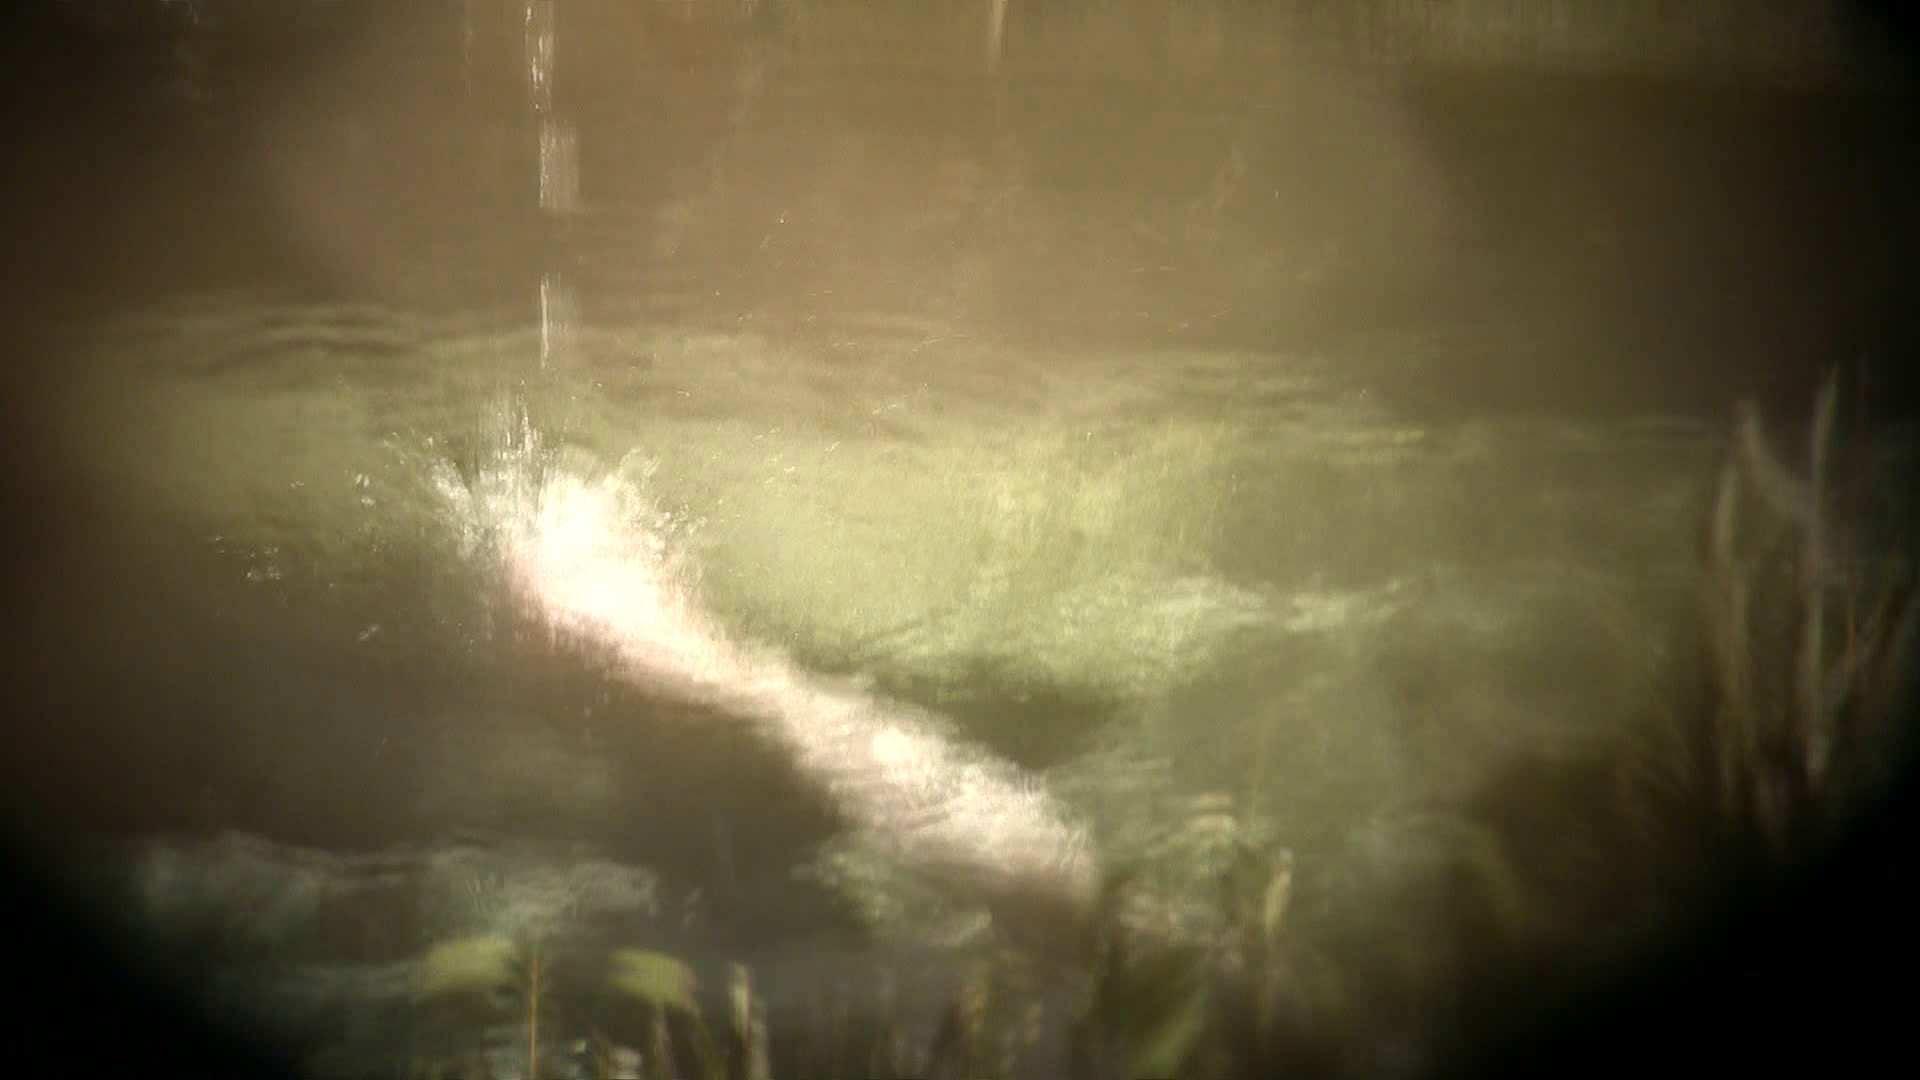 Aquaな露天風呂Vol.698 美しいOLの裸体 われめAV動画紹介 104pic 74